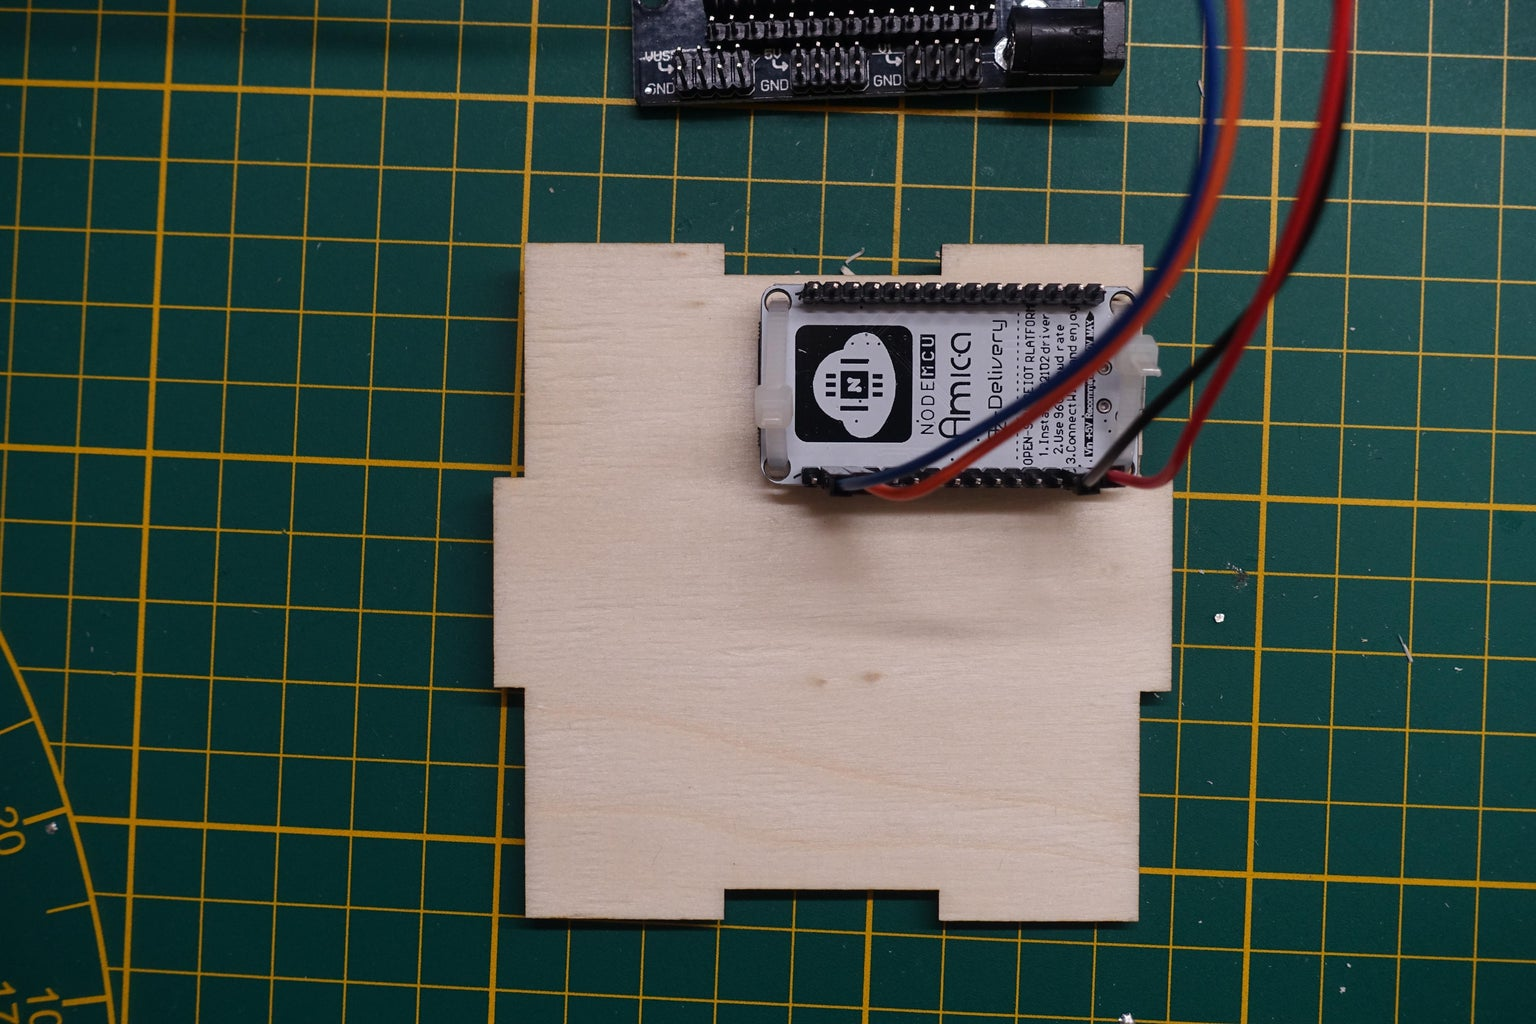 Build the Enclosure & Install Display and Sensor